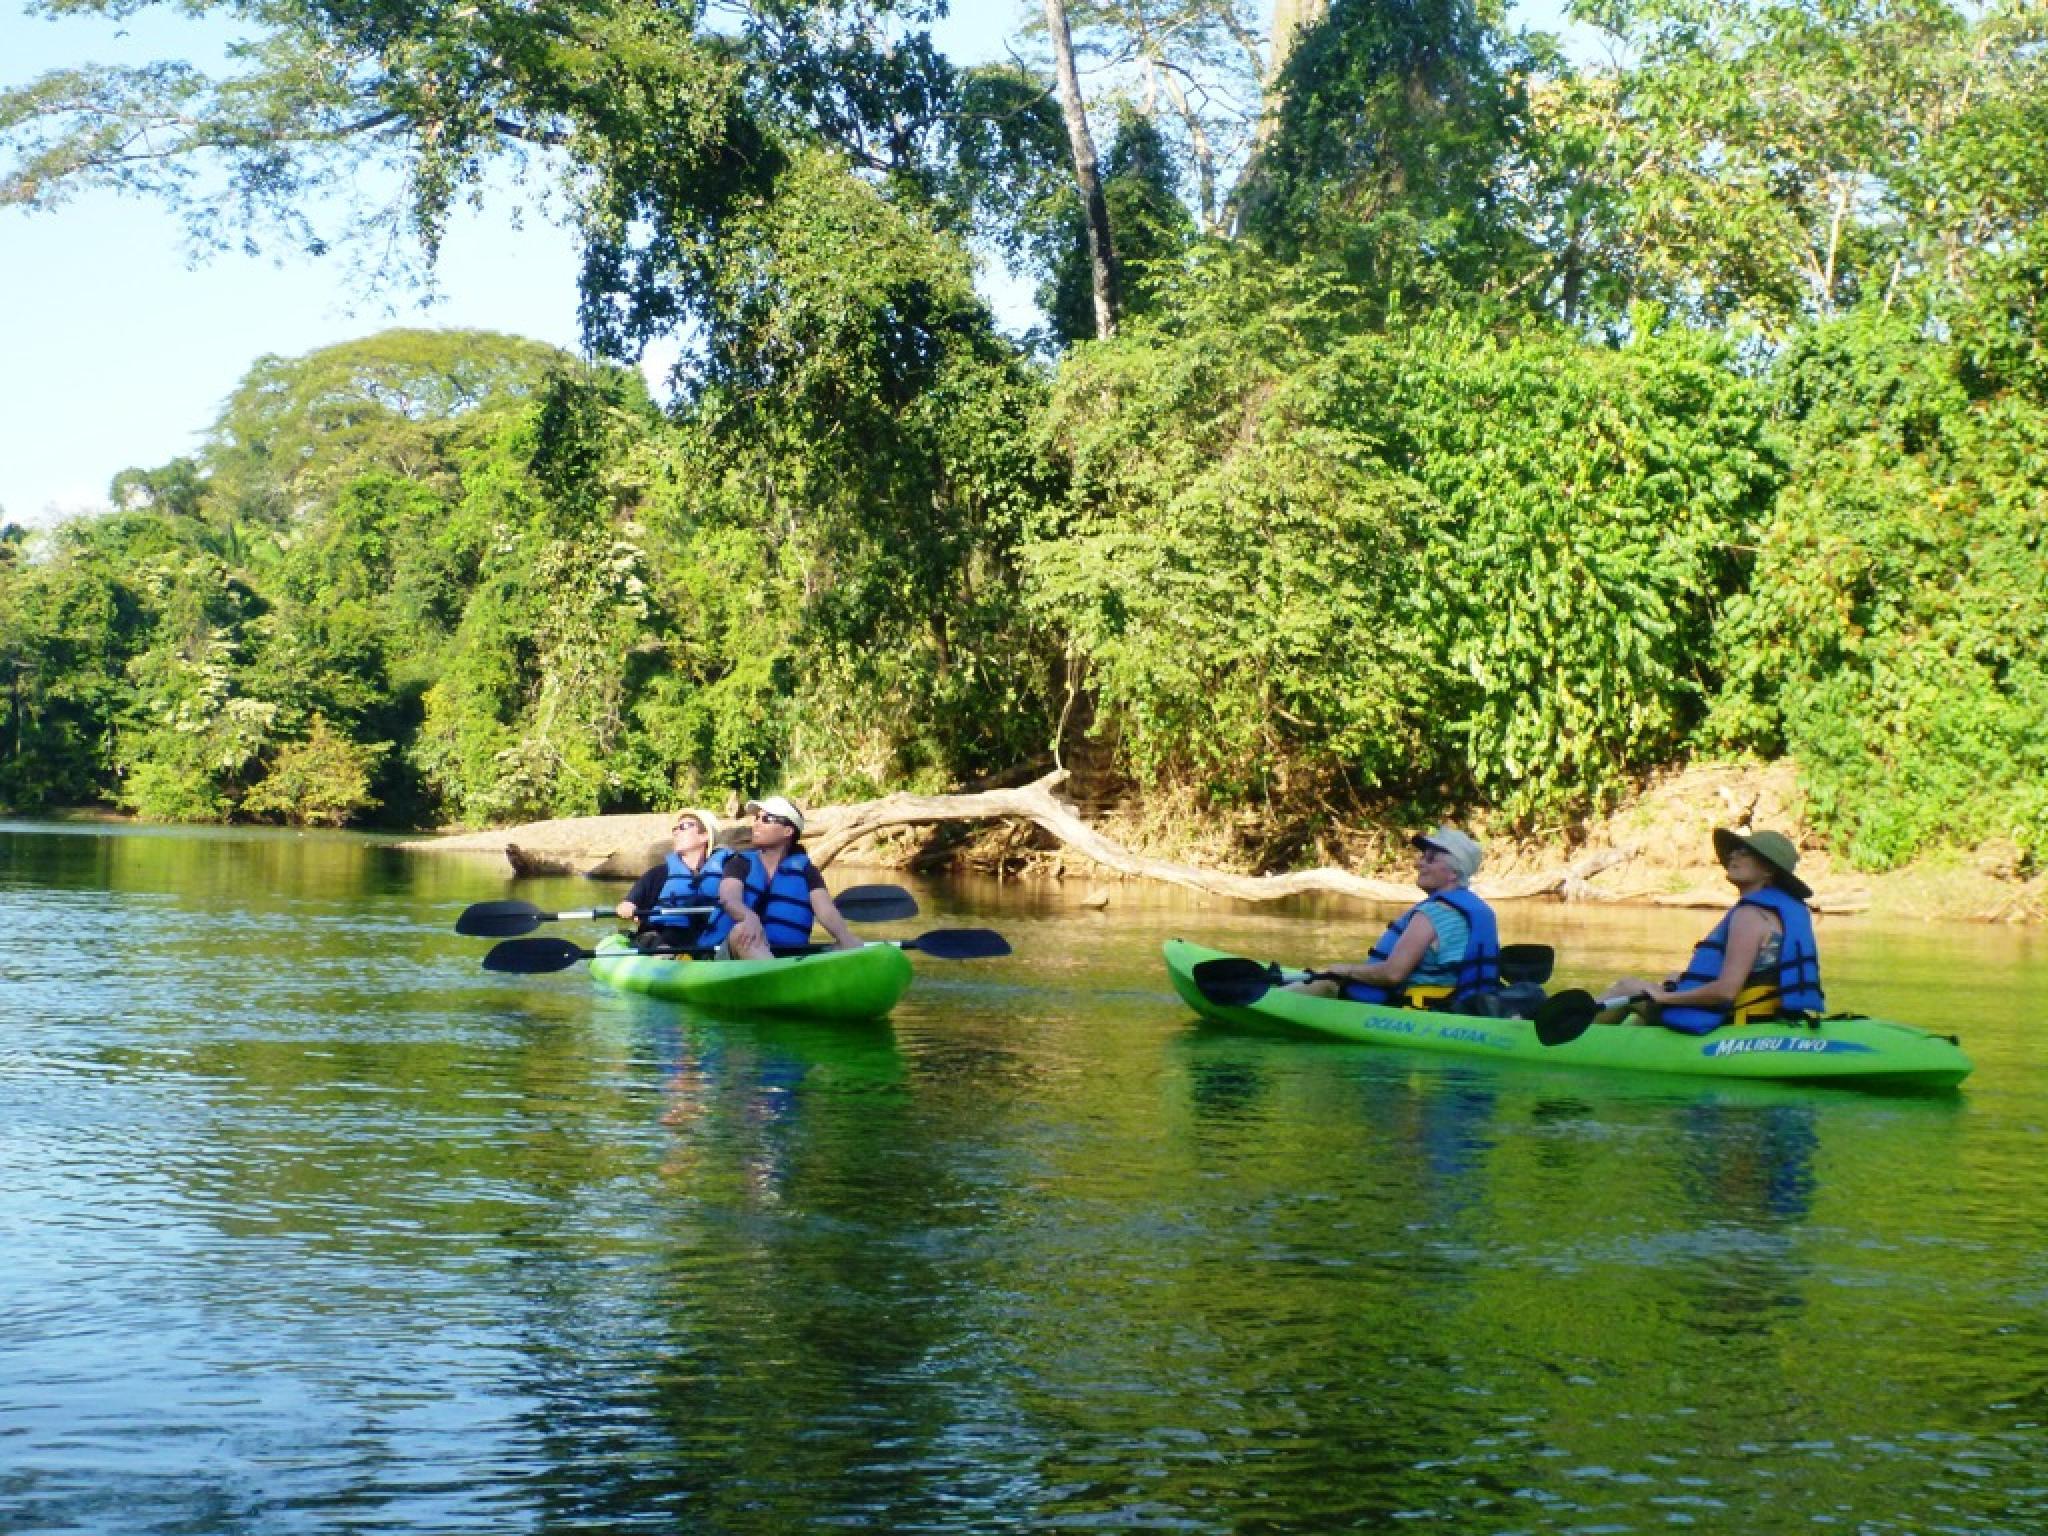 Tour de naturaleza y manglar en kayak